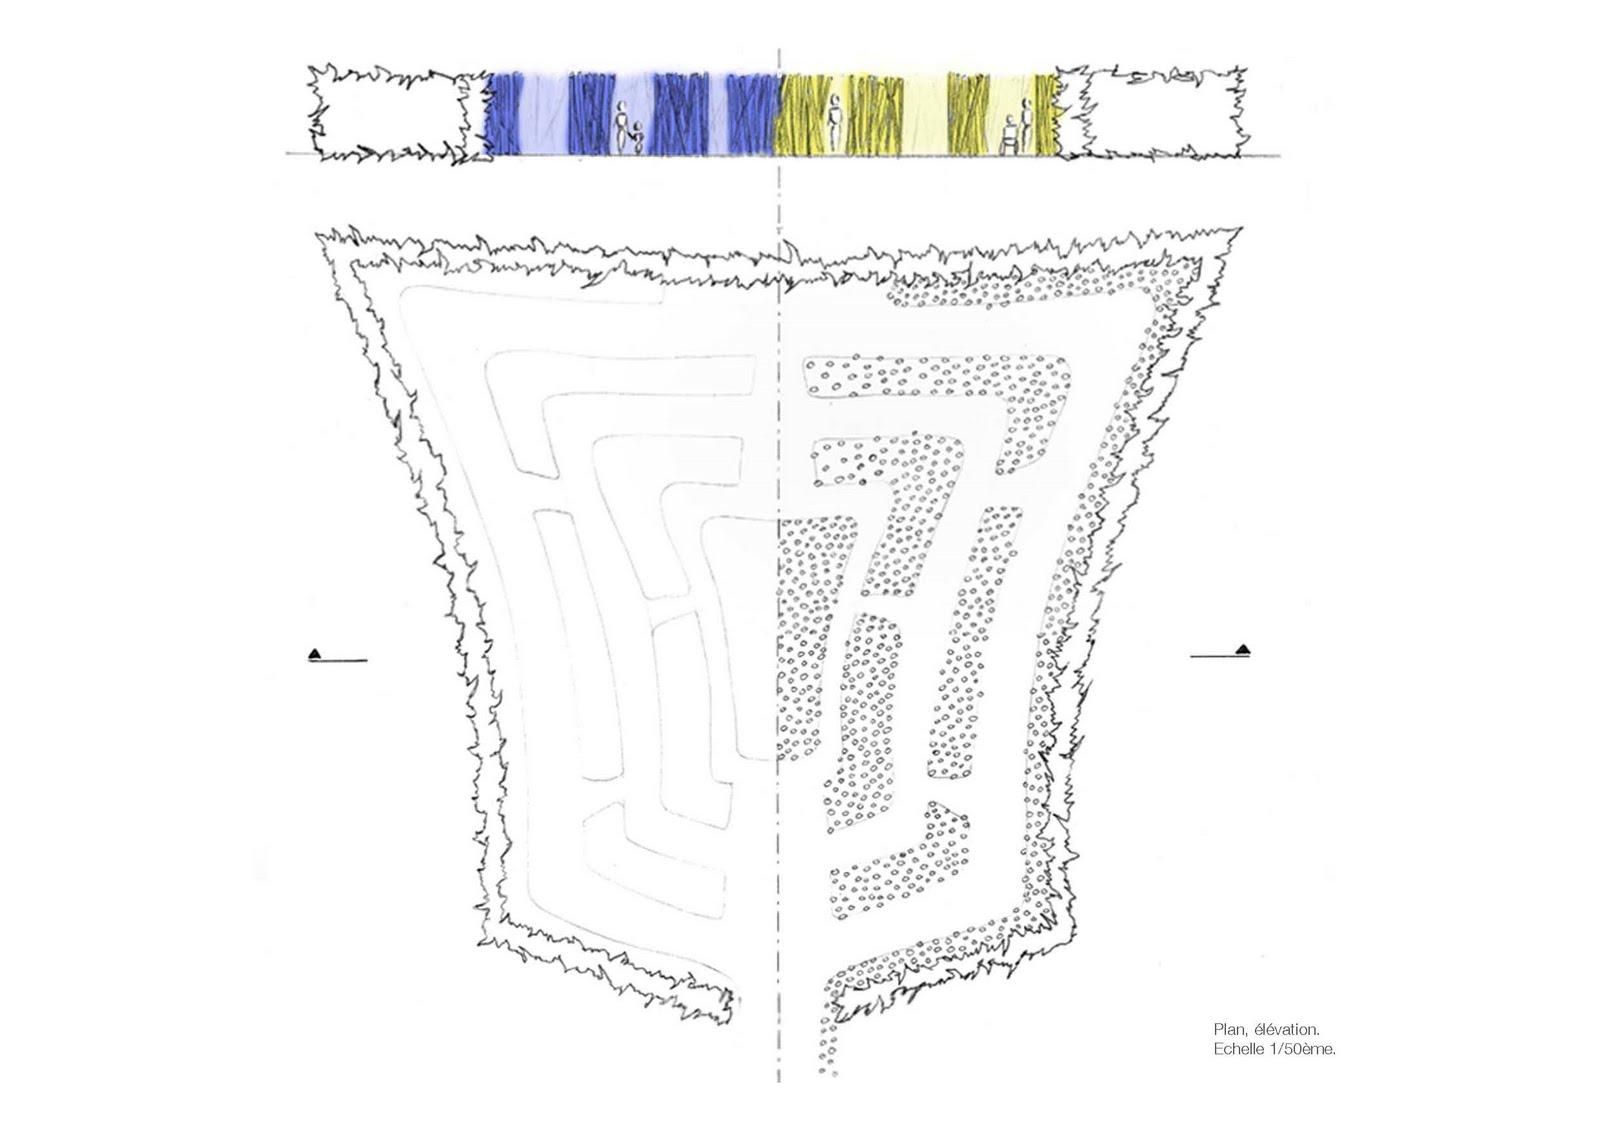 marion tiersen designer d u0026 39 espace  concours des jardins de